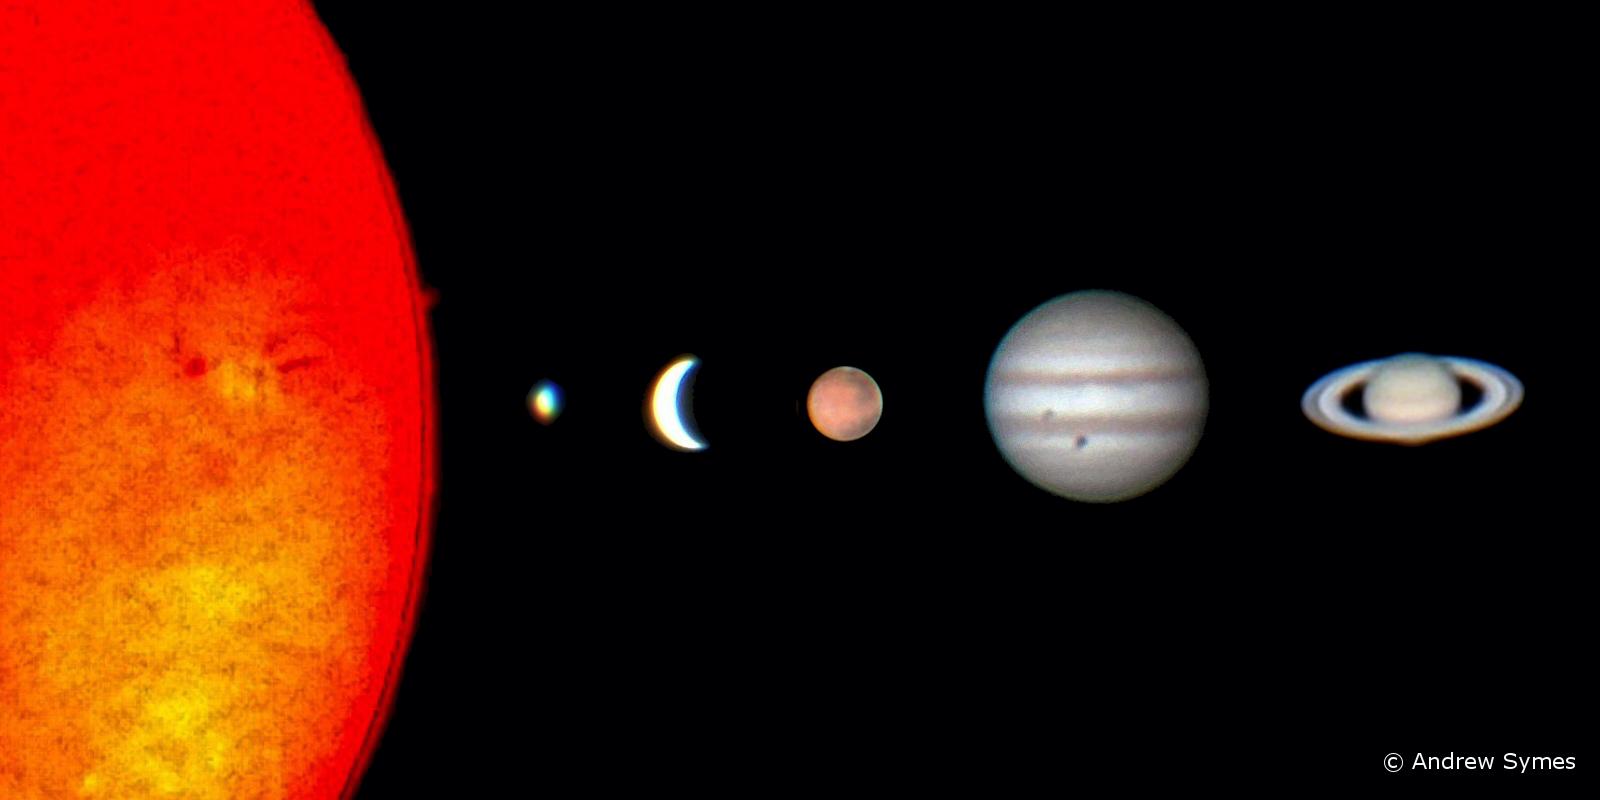 Celestron Nexstar 8se Moon Celestron Nexstar 8se And